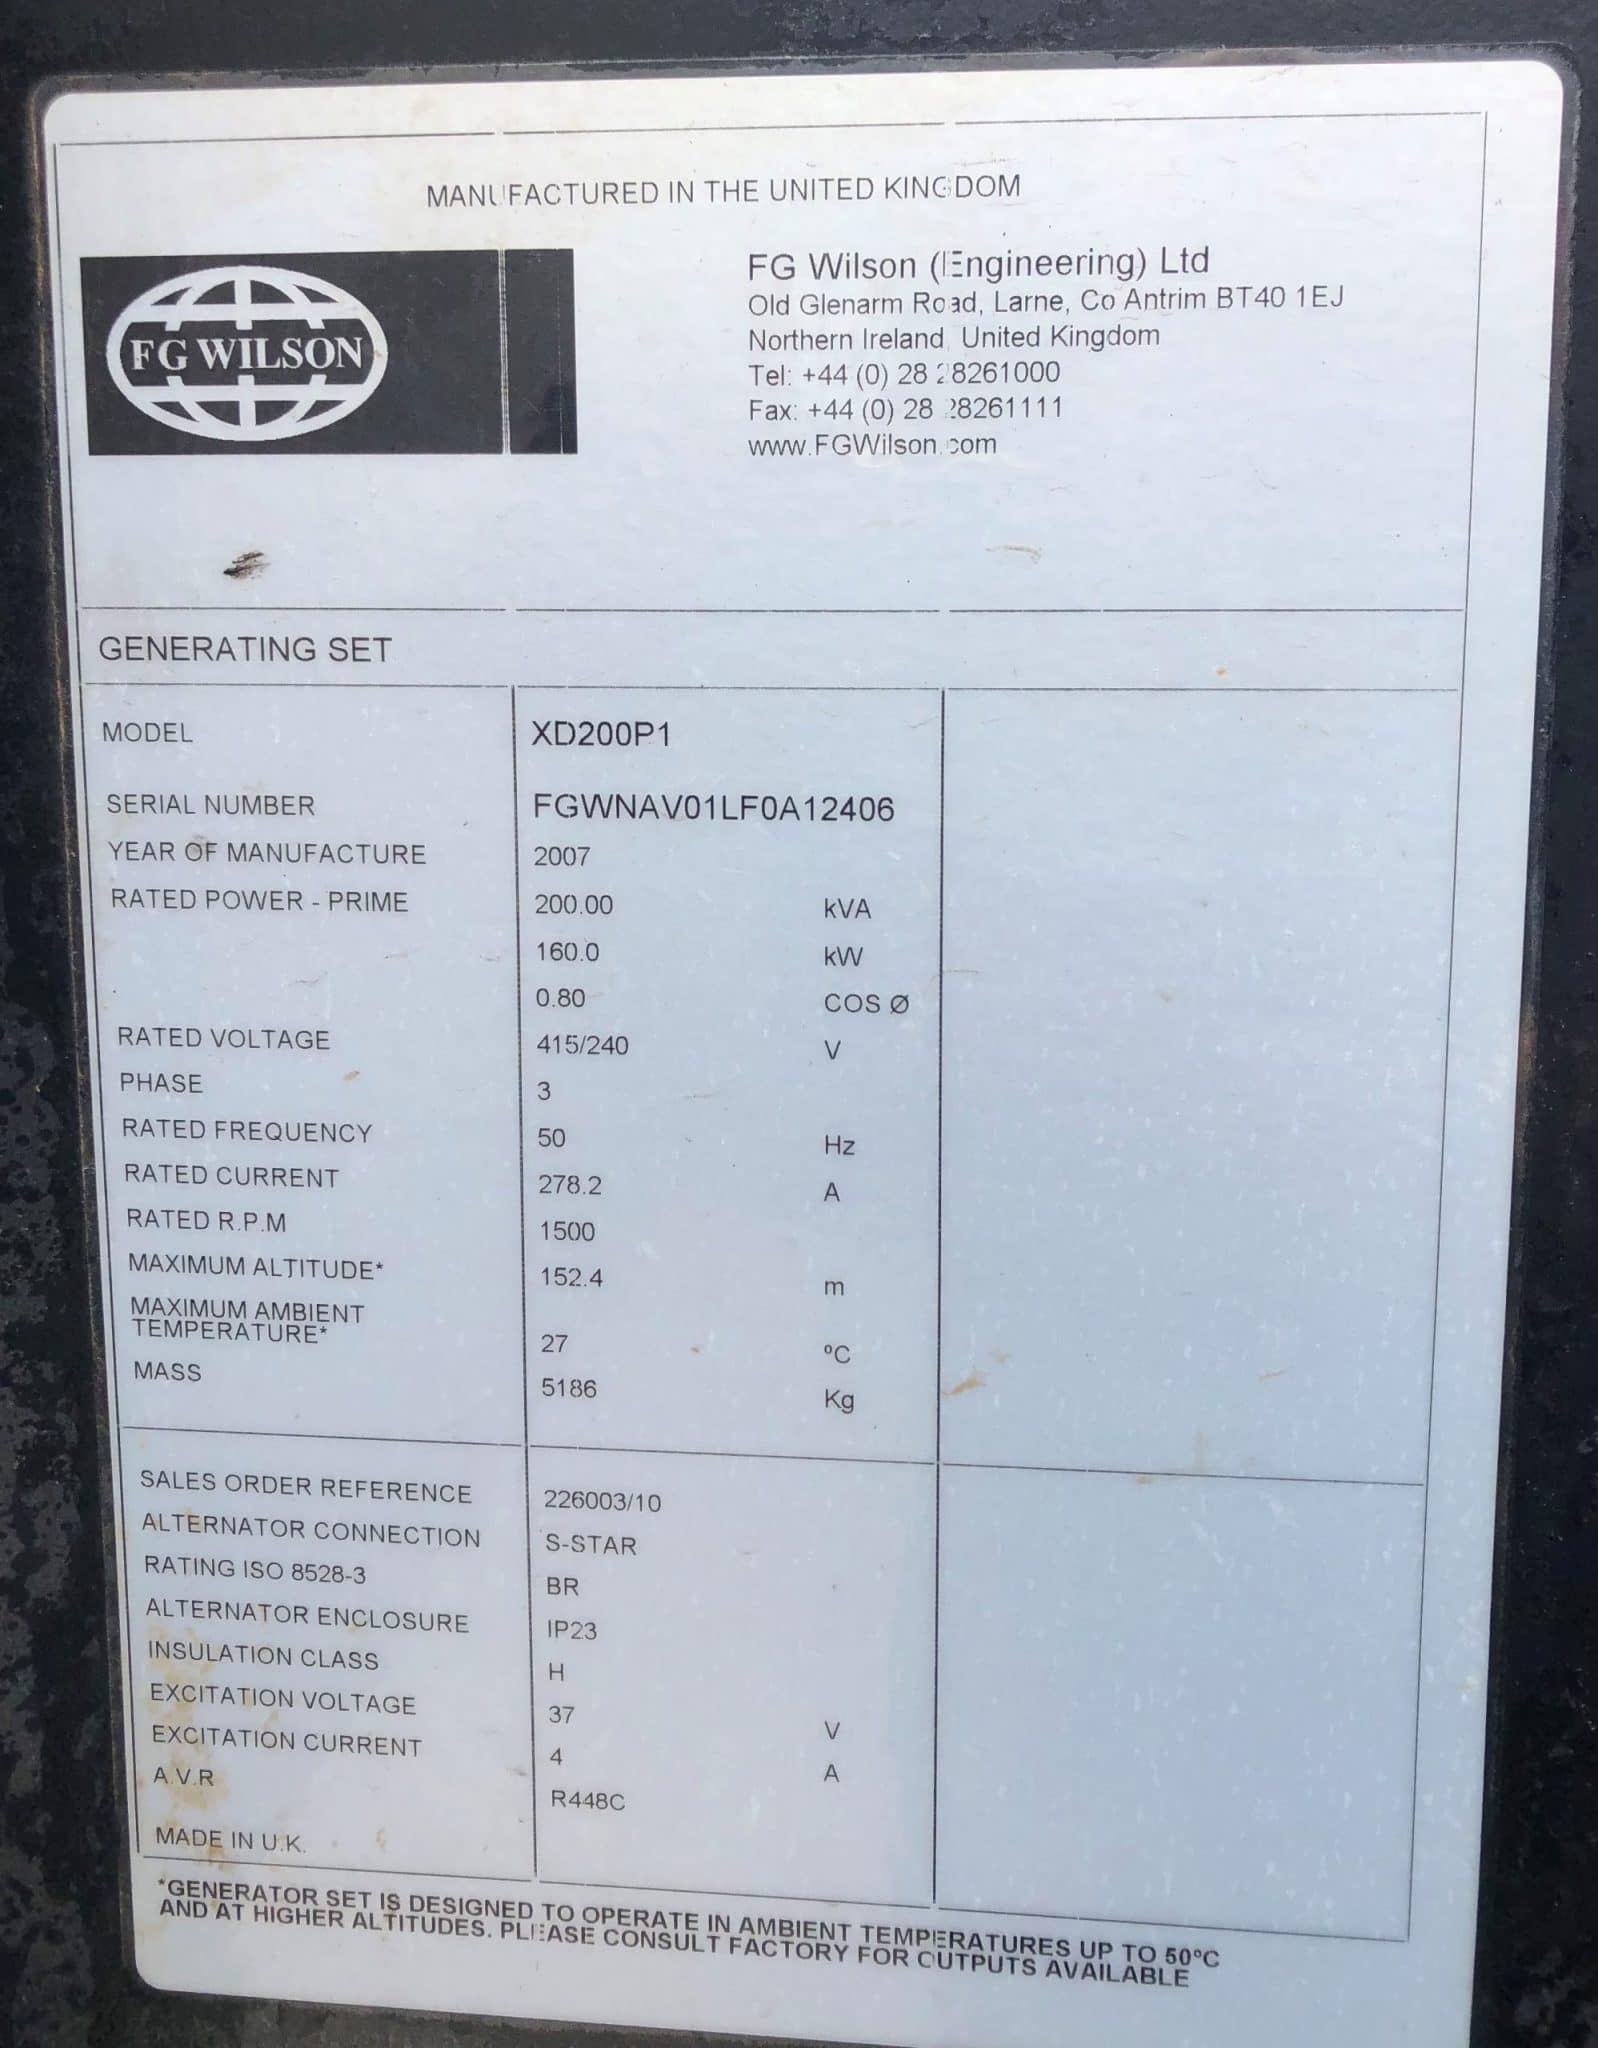 200 Kva FG Wilson Perkins/Leroy Acoustic (Rental Specs) Generator for sale details